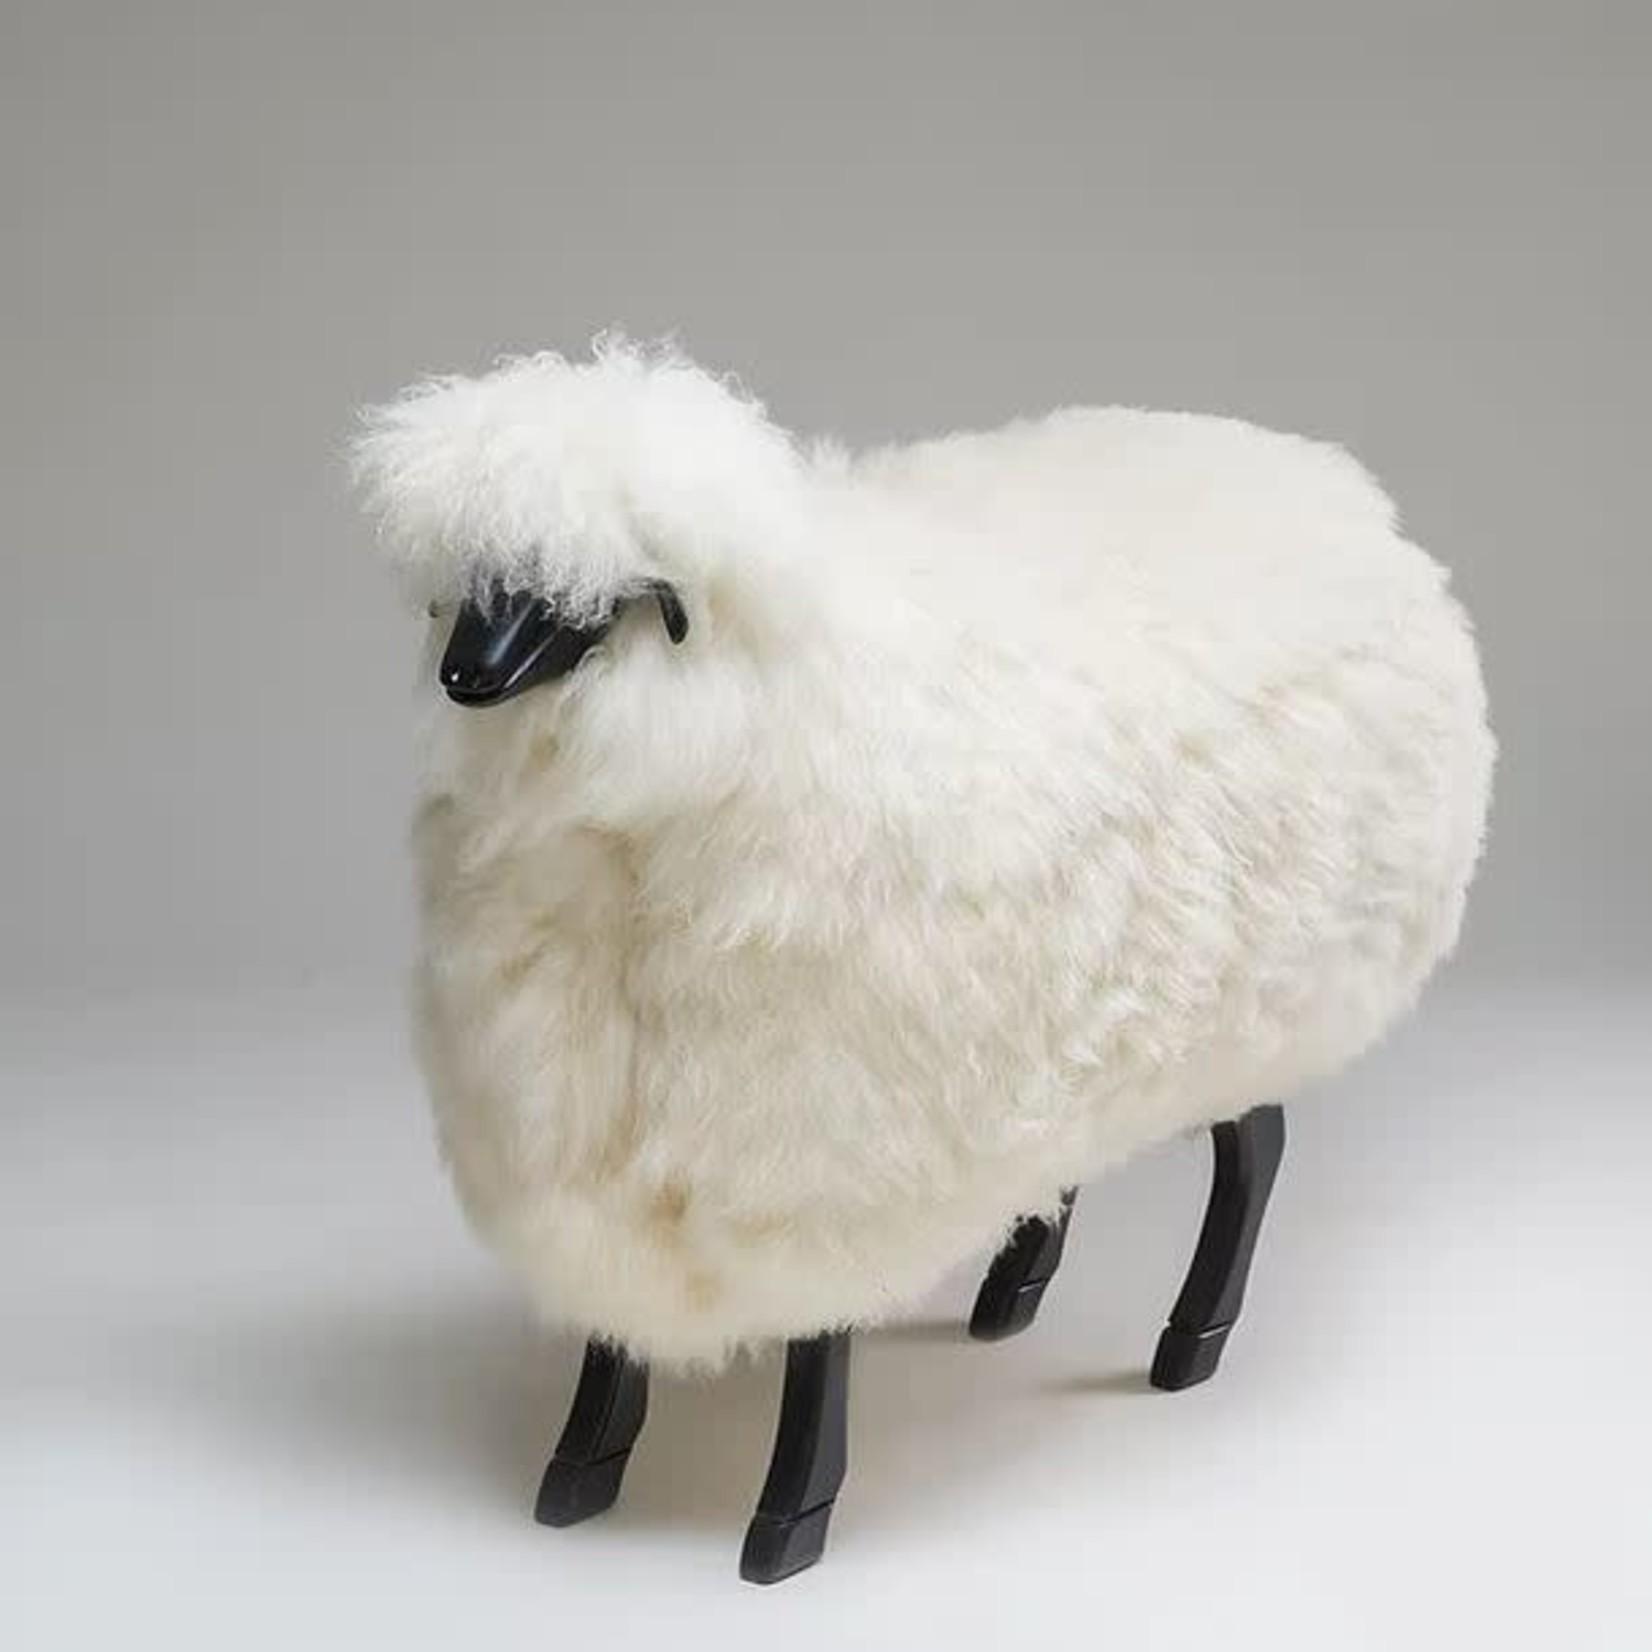 Art & Co - Tuline Wood Sheep